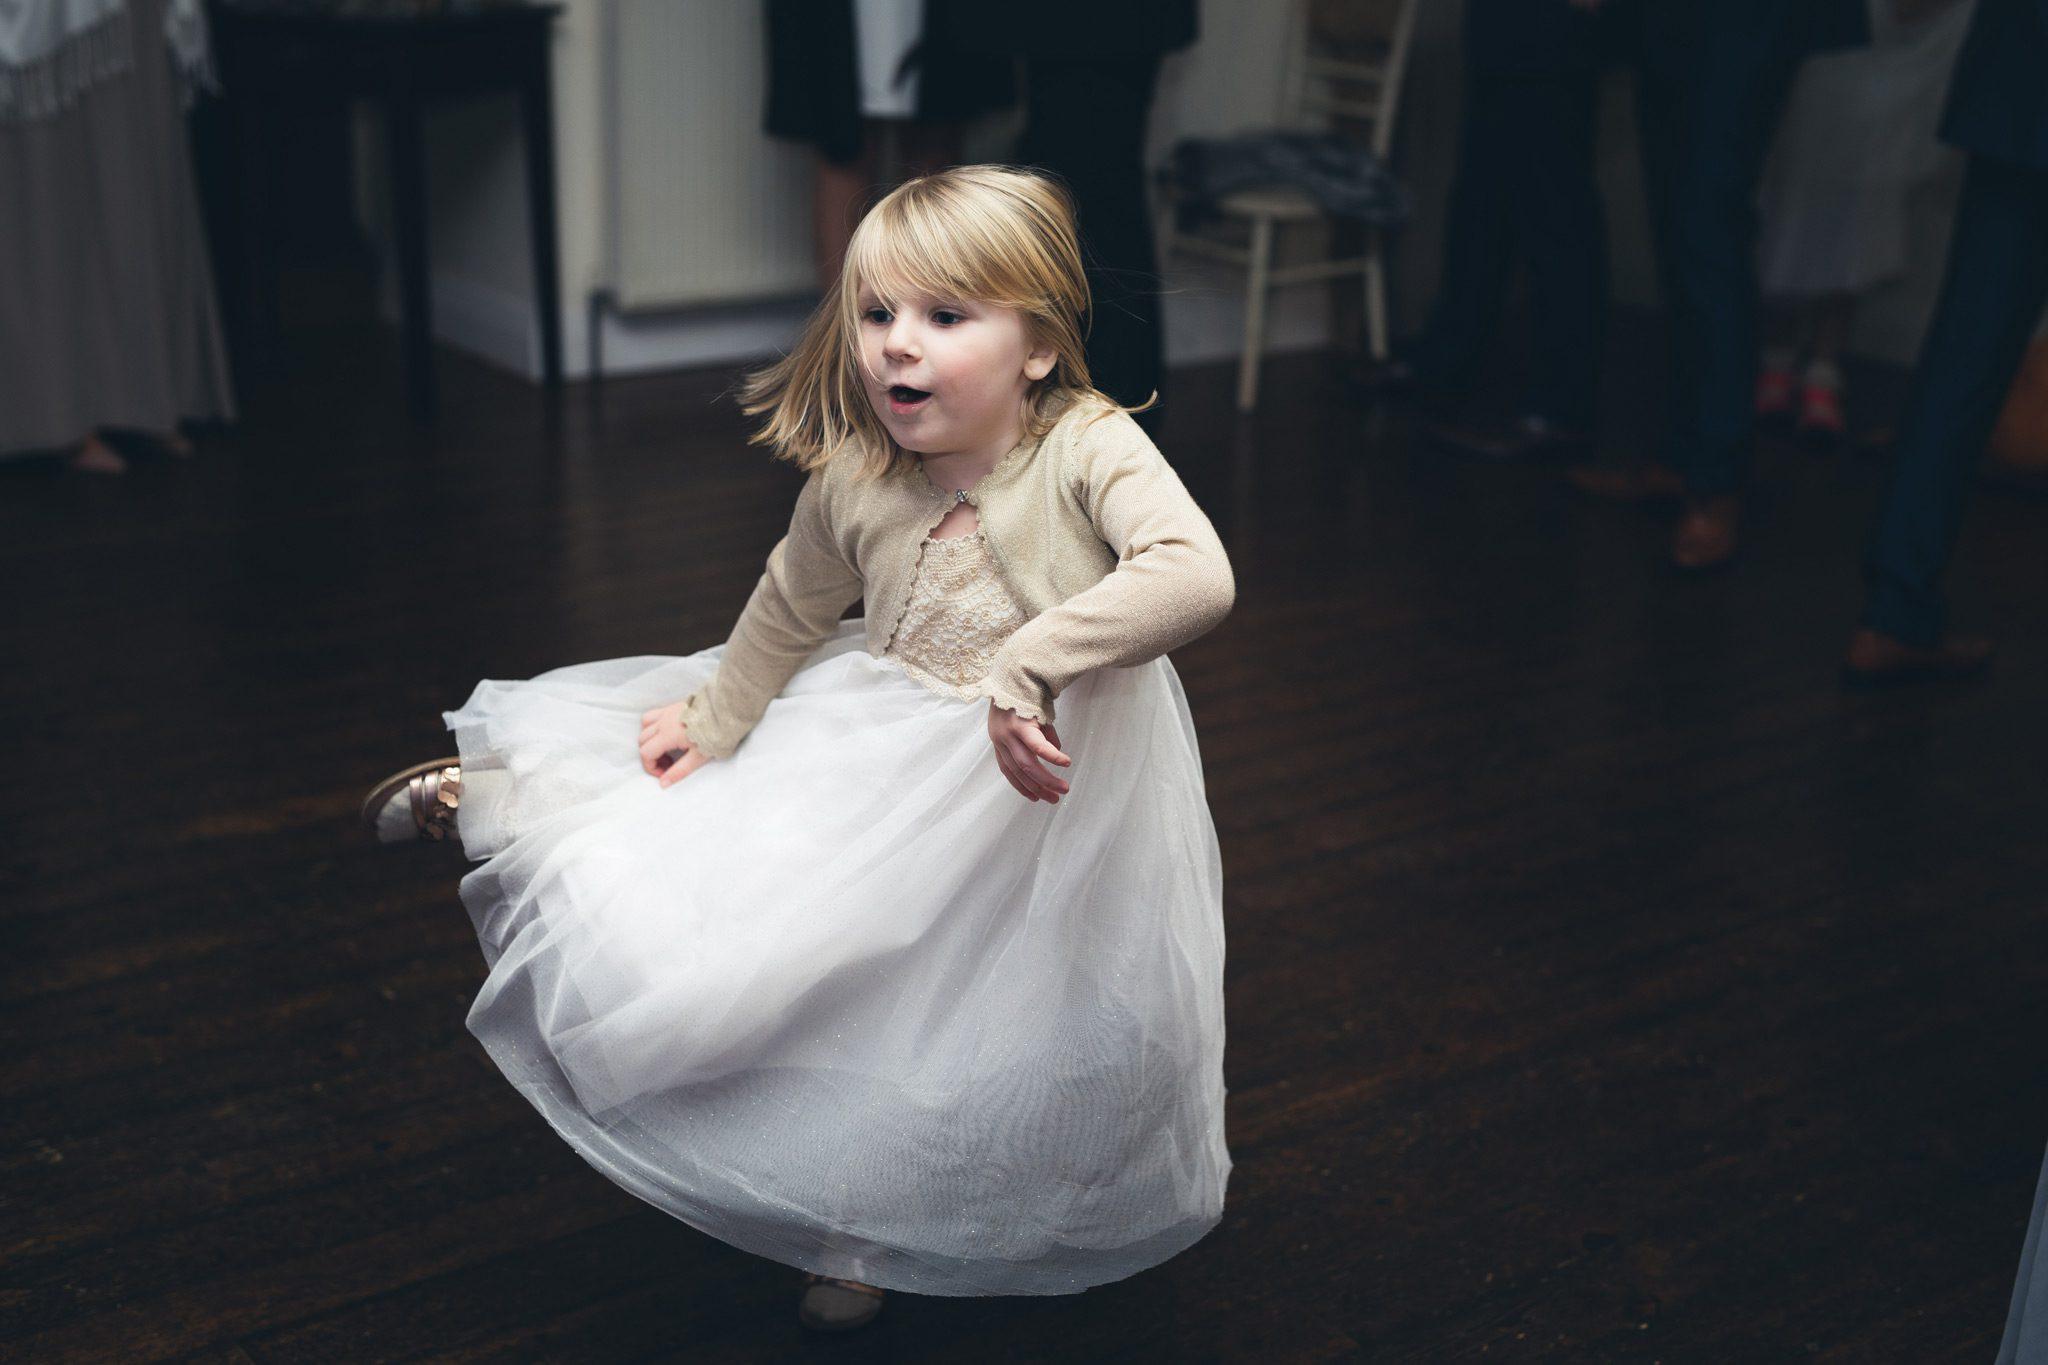 Flowergirl dancing at a wedding